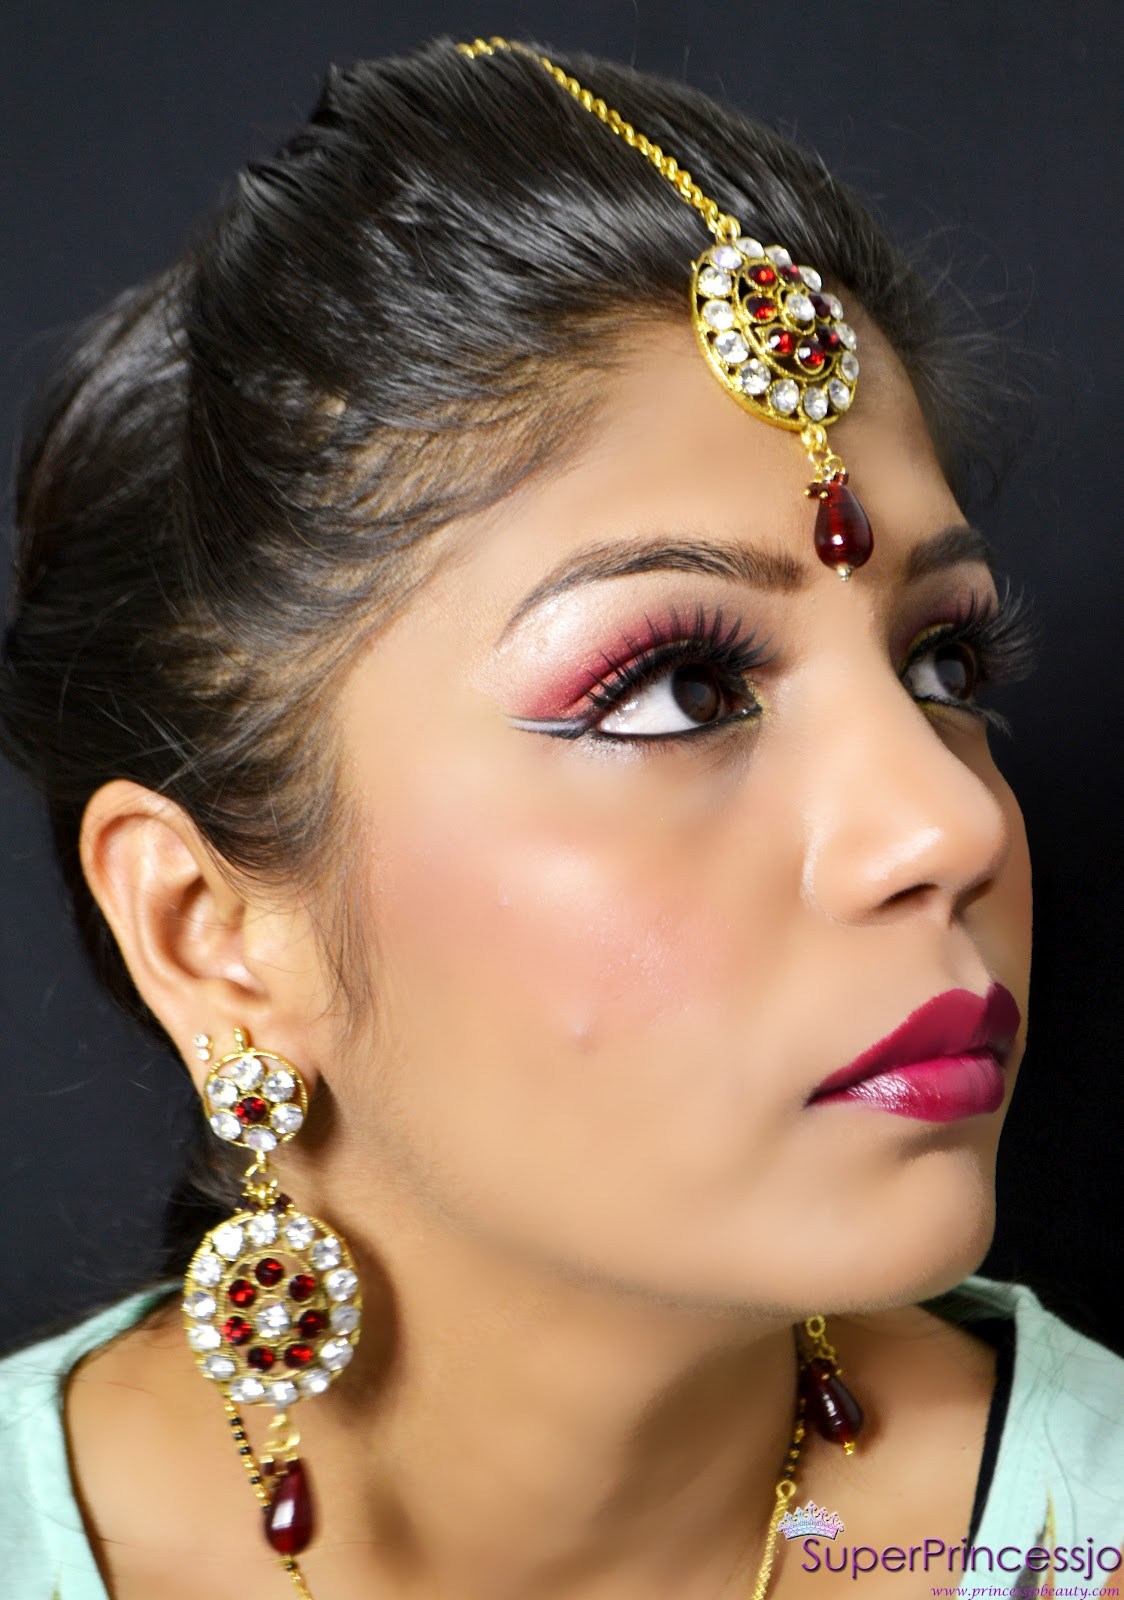 Makeup Video Tutorial: SuperPrincessjo : INDIAN BRIDAL WEDDING MAKEUP -RED GOLD